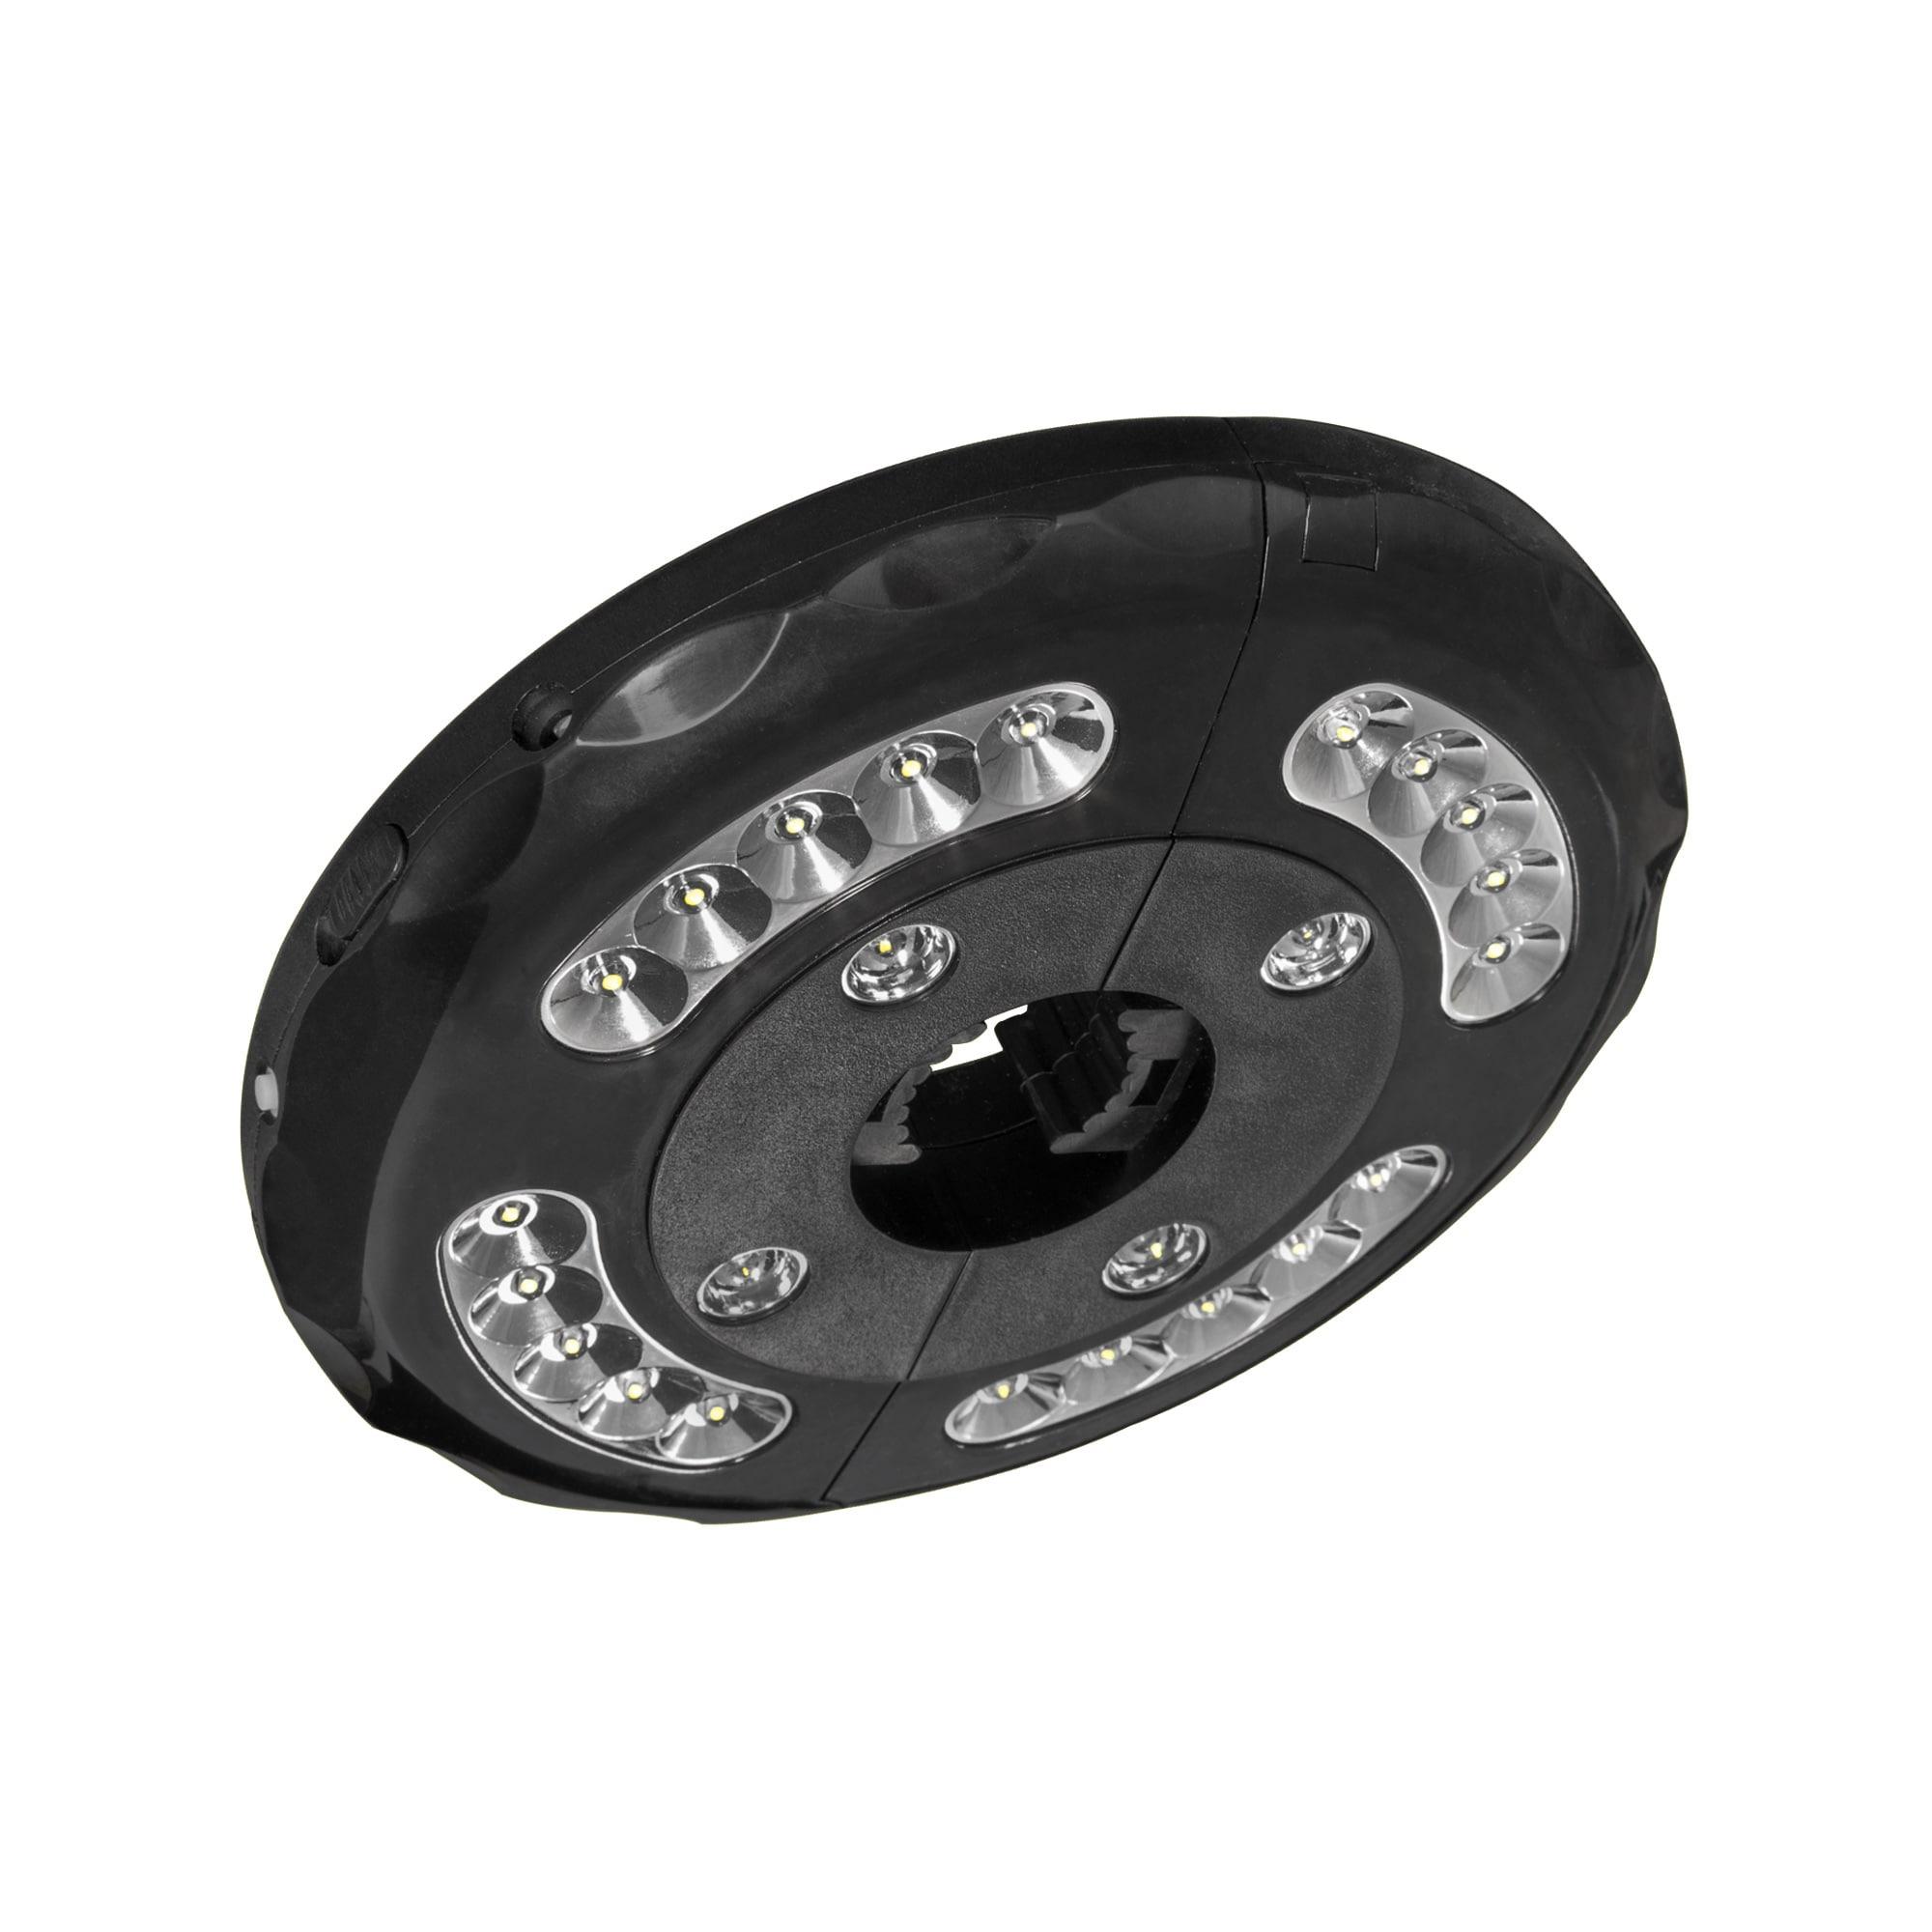 led sonnenschirmlampe sonnenschirm beleuchtung gartenschirm lampe schirmleuchte ebay. Black Bedroom Furniture Sets. Home Design Ideas